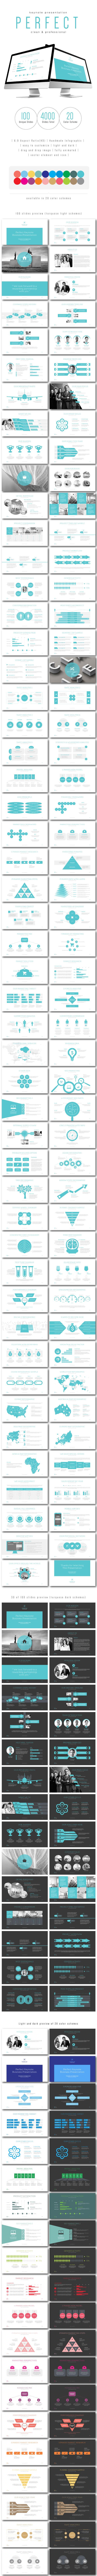 GraphicRiver Multipurpose Keynote Presentation Vol 09 9087764